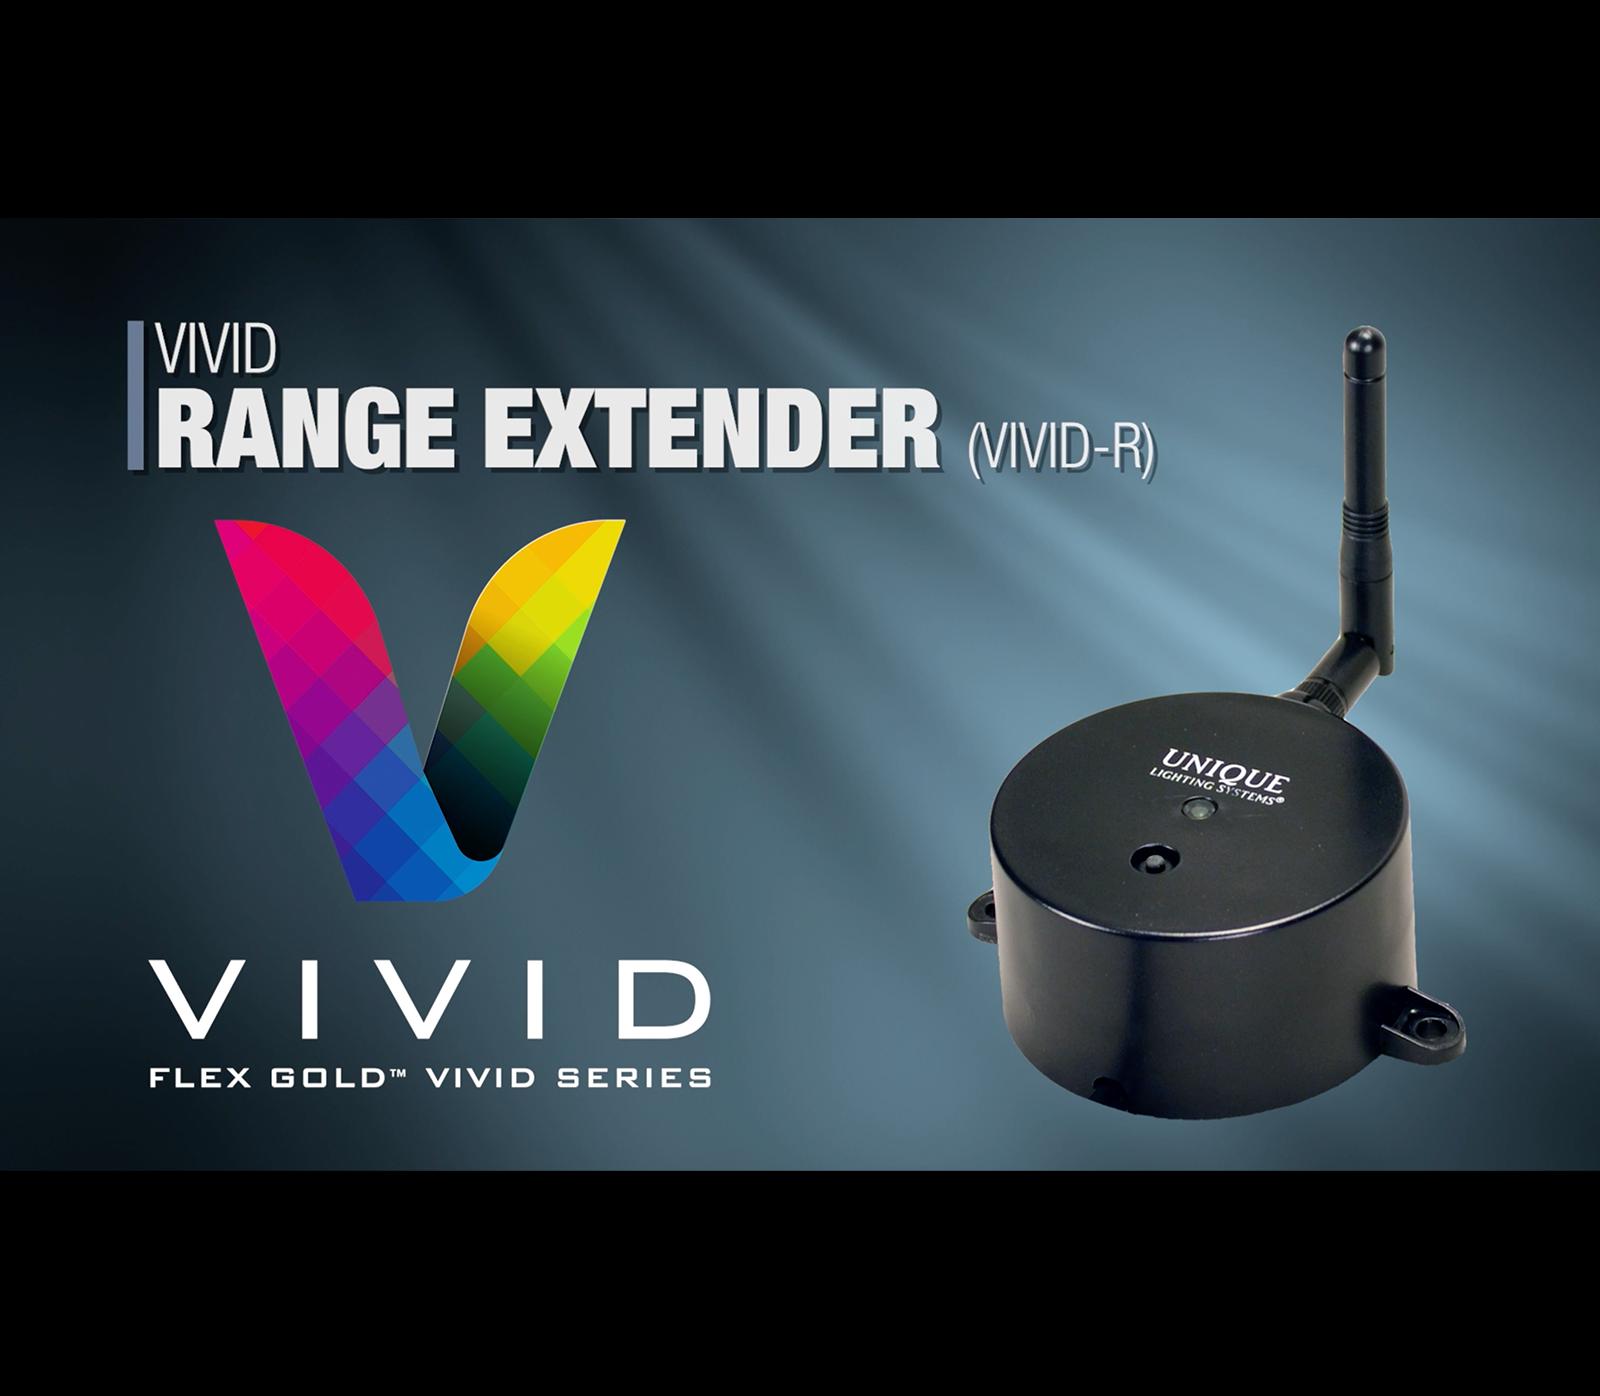 VIVID Range Extender Product Overview